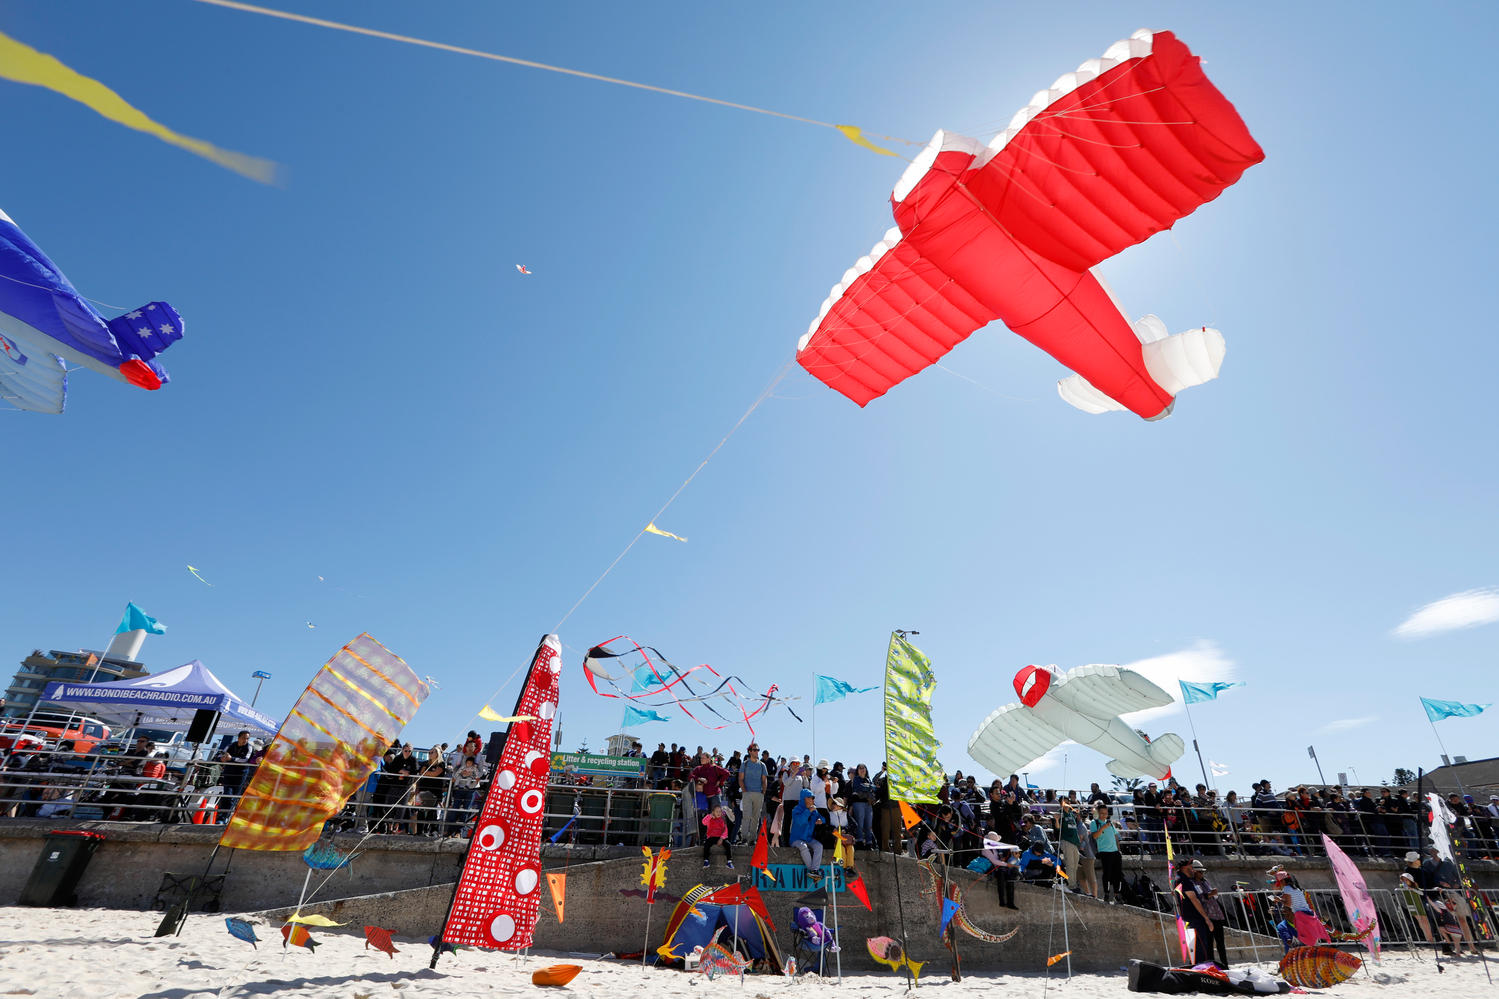 2018 Plane Kites (photo: Chris Pavlich)